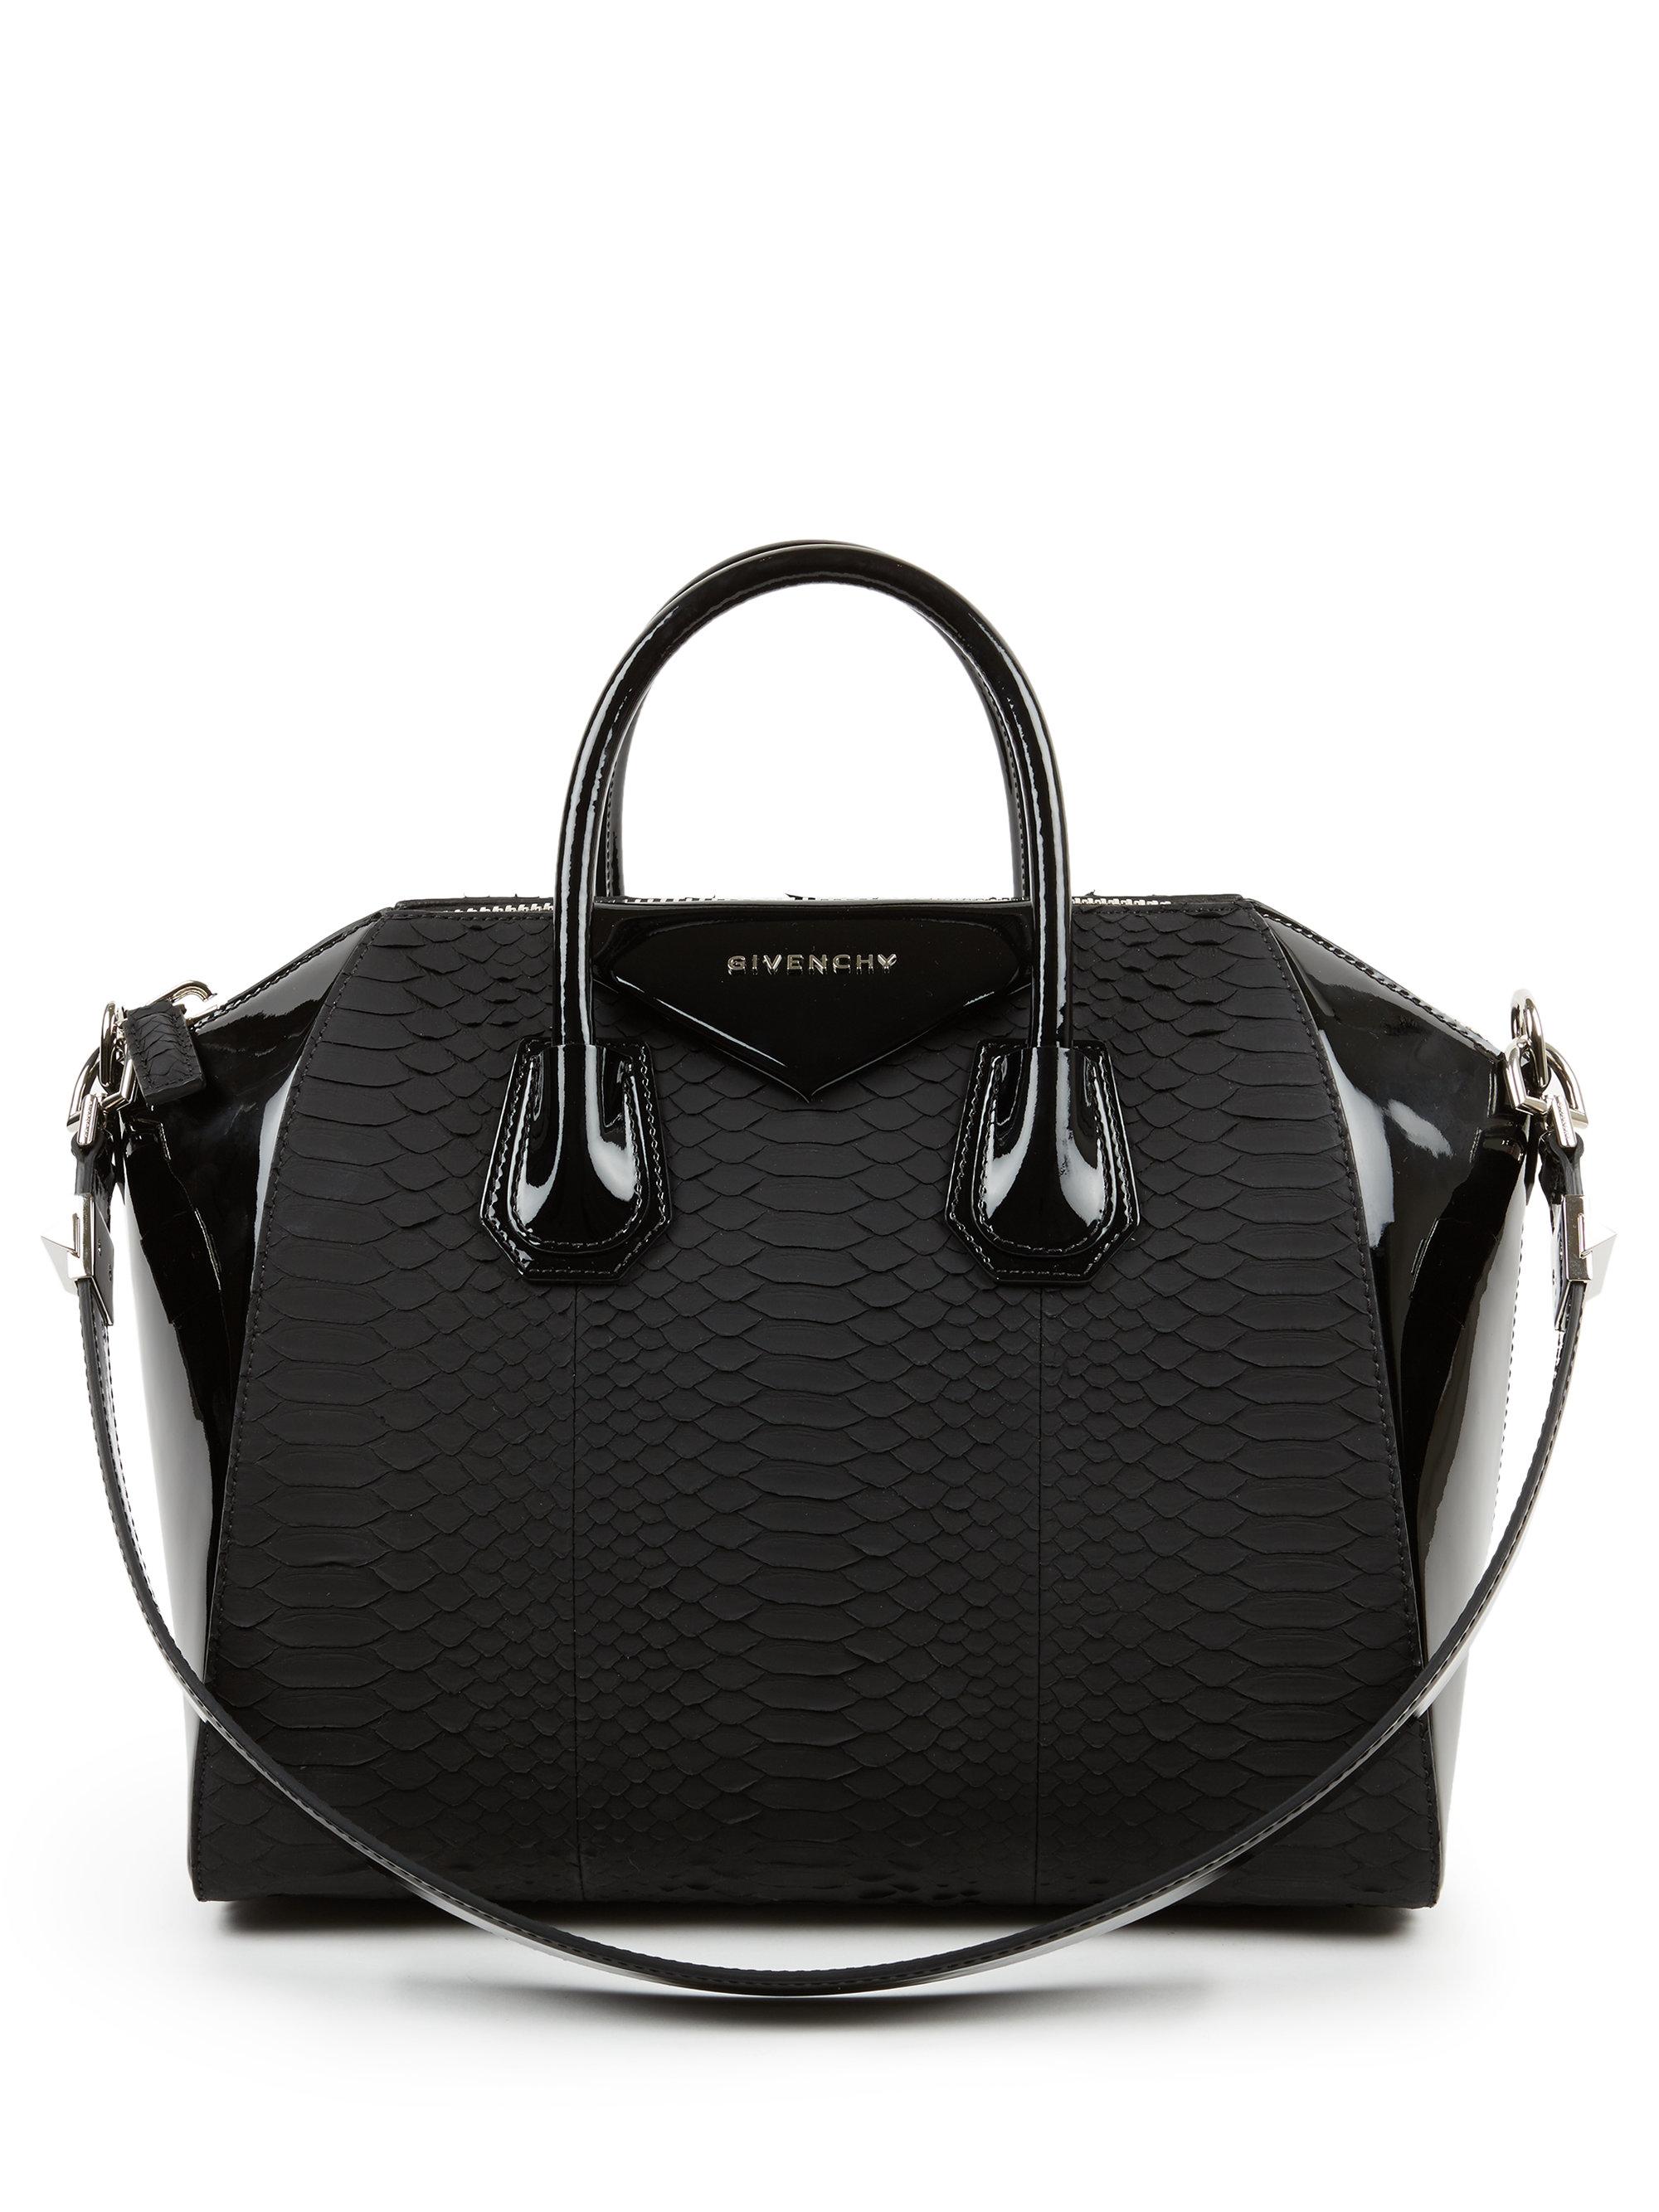 141cae330cba Lyst - Givenchy Antigona Medium Python   Patent Leather Satchel in Black